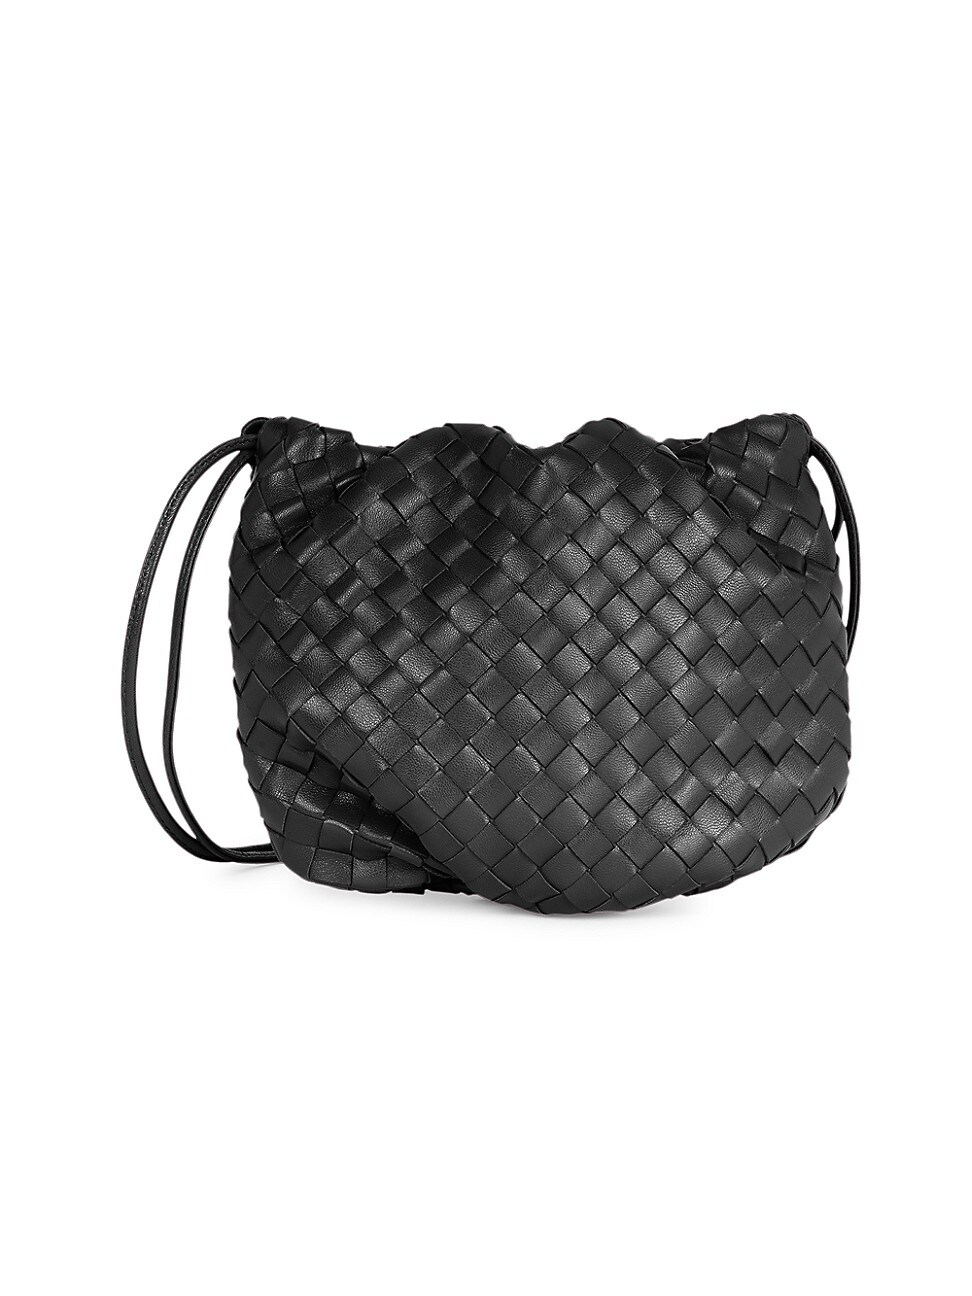 Bottega Veneta Women's Mini Bulb Leather Clutch In Black